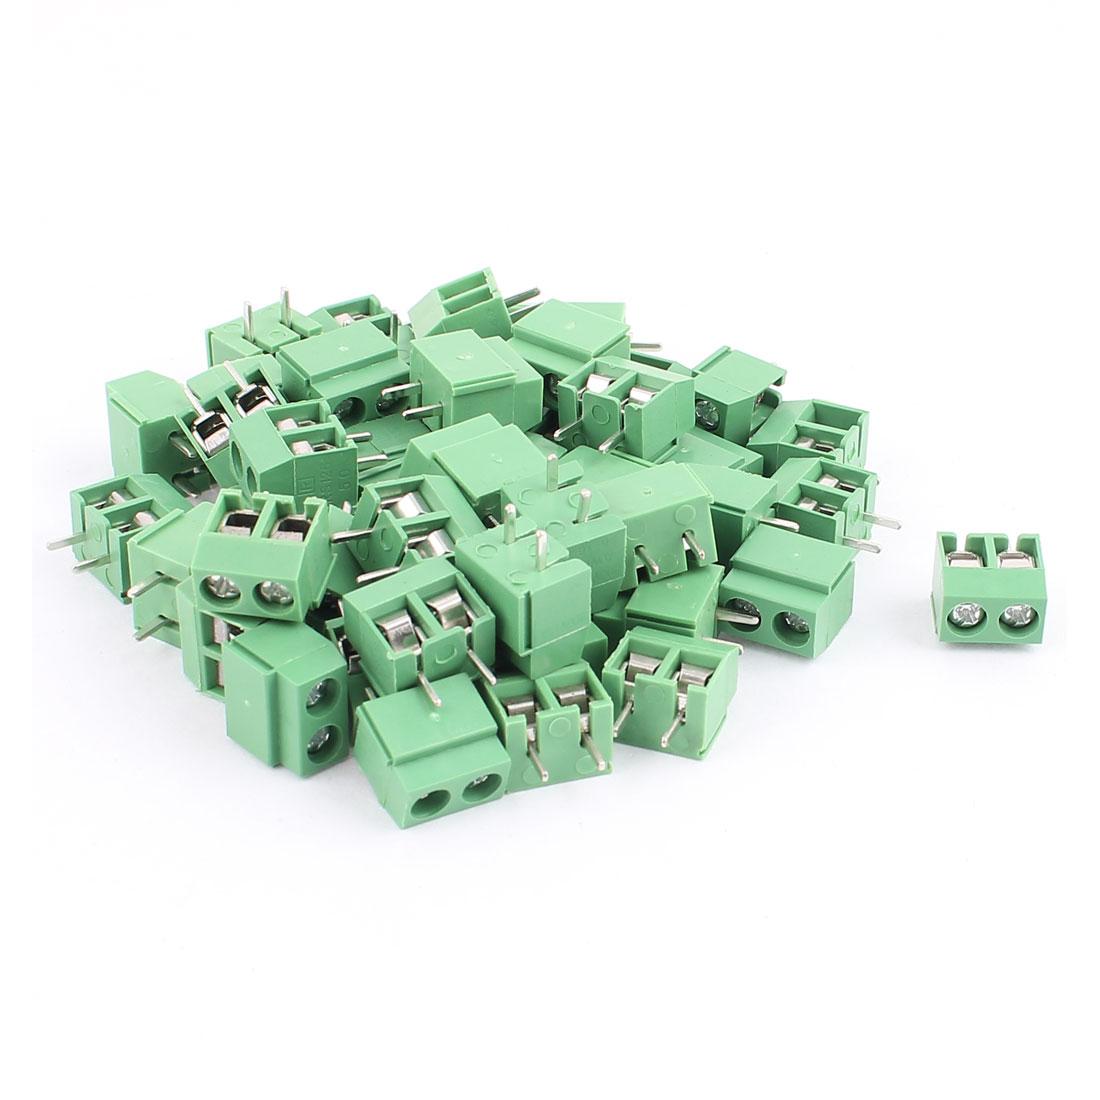 50 Pcs 5.08mm Pitch 2P Male PCB Pluggable Terminal Block Connector